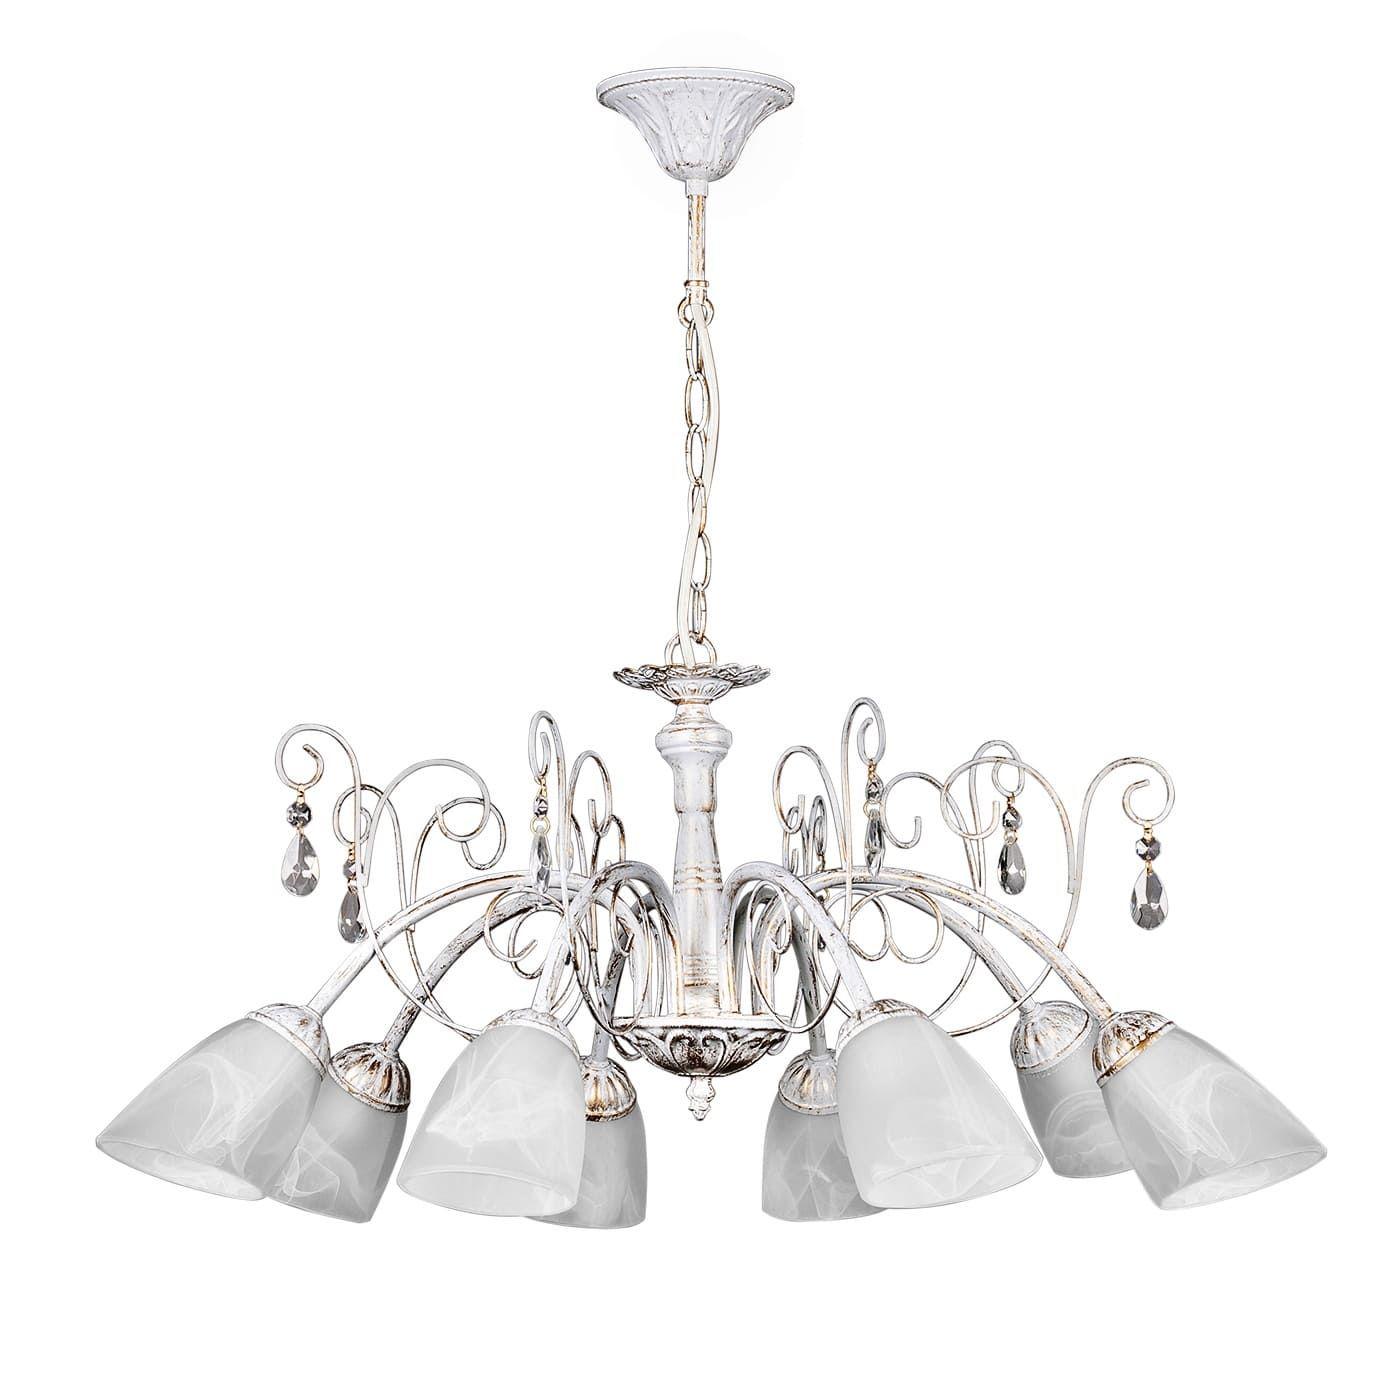 PETRASVET / Pendant chandelier S2020-8, 8xE14 max. 60W